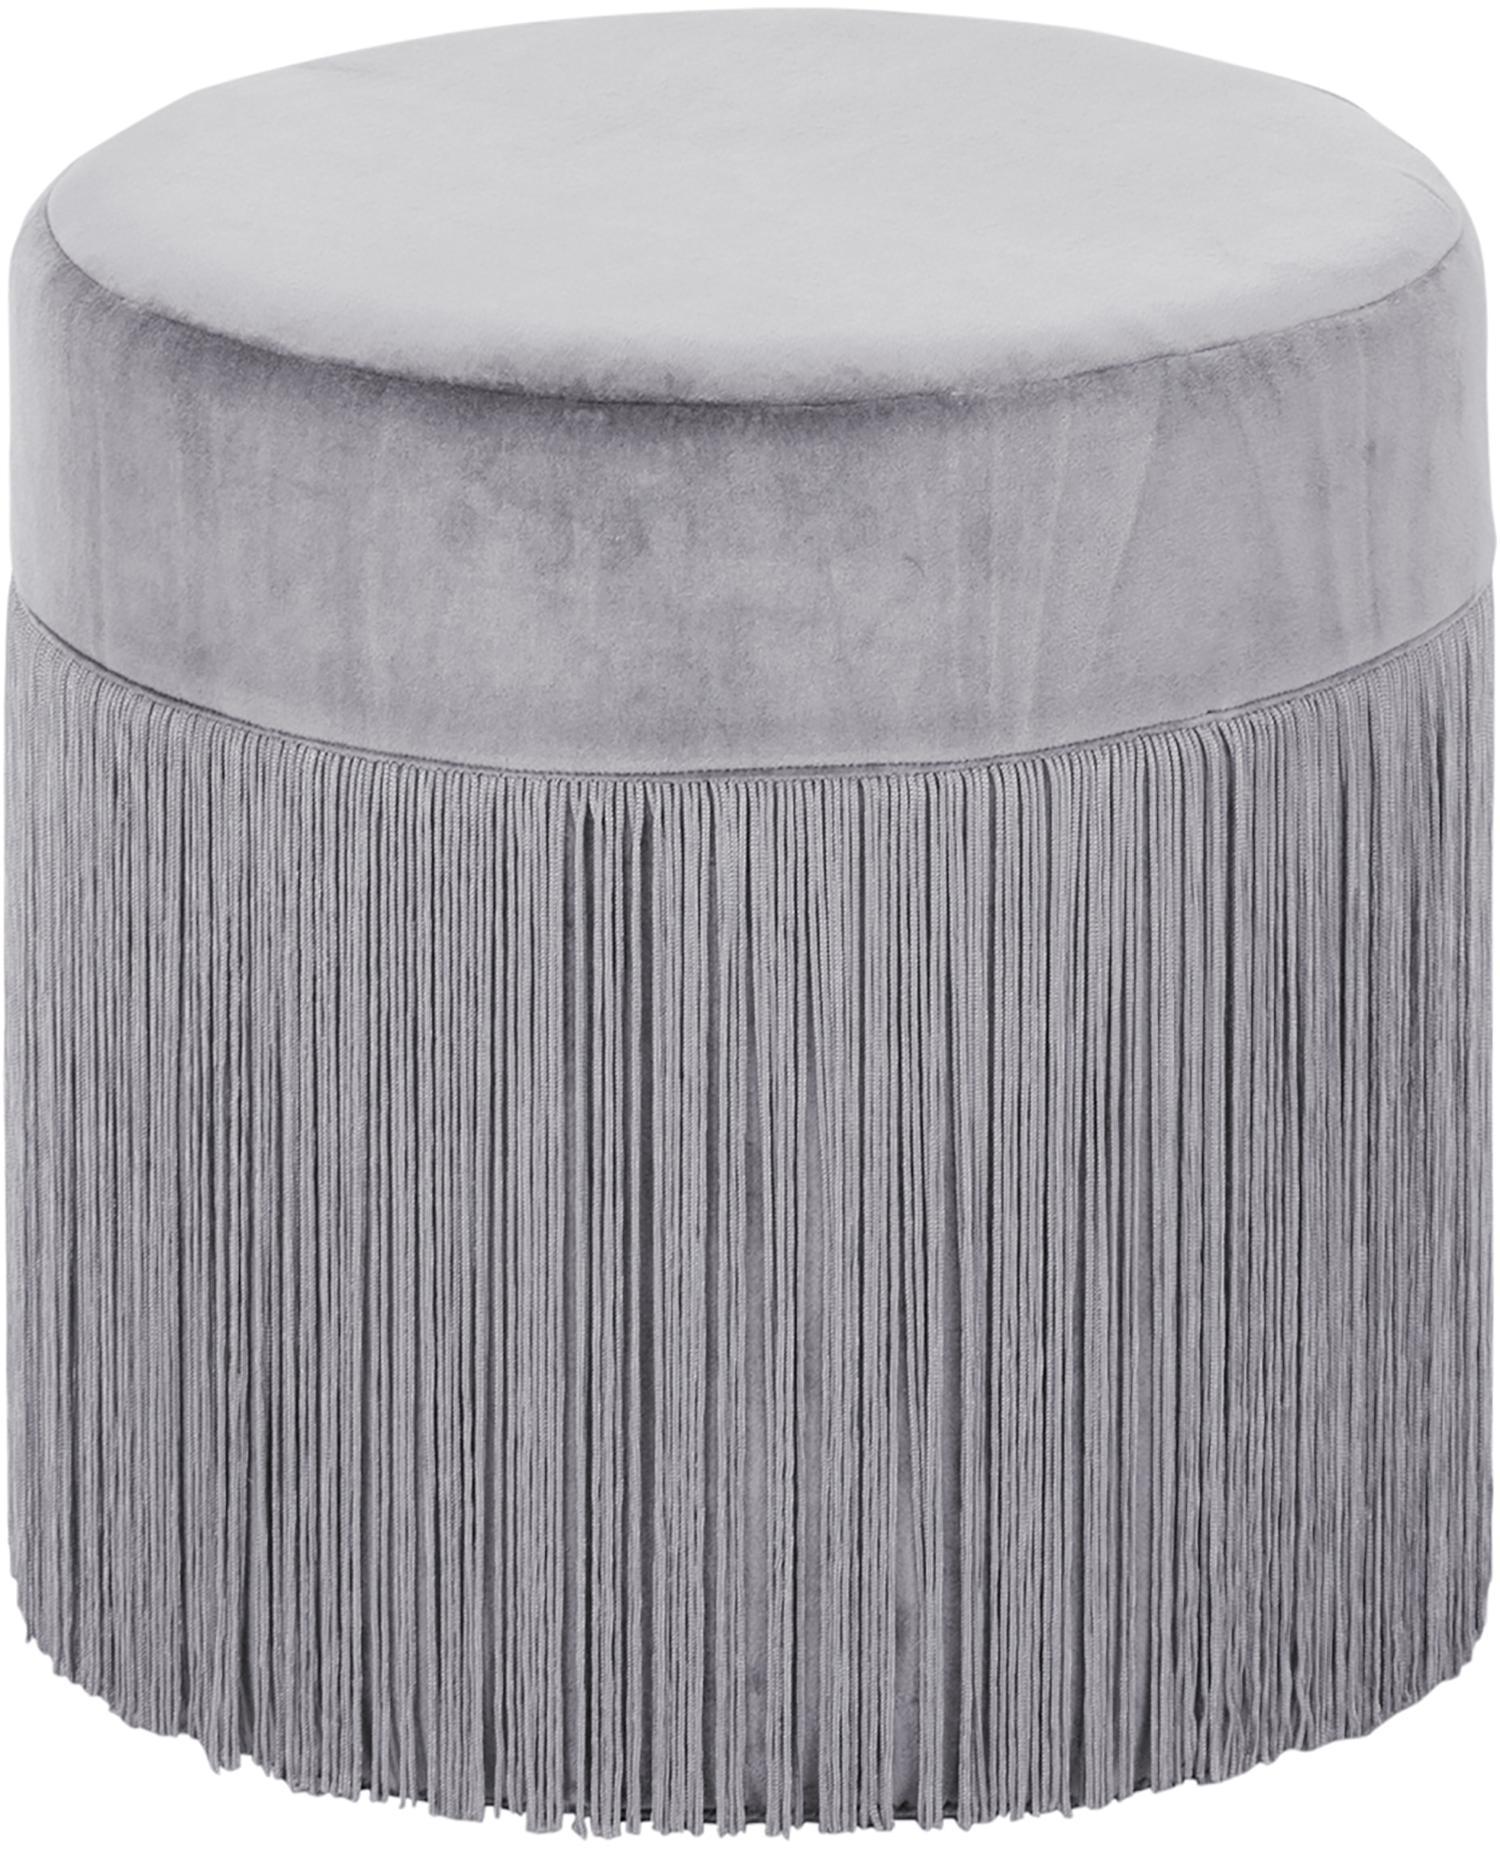 Puf con flecos Adriana, Tapizado: terciopelo de algodón, Flecos: viscosa, Gris claro, Ø 40 x Al 40 cm